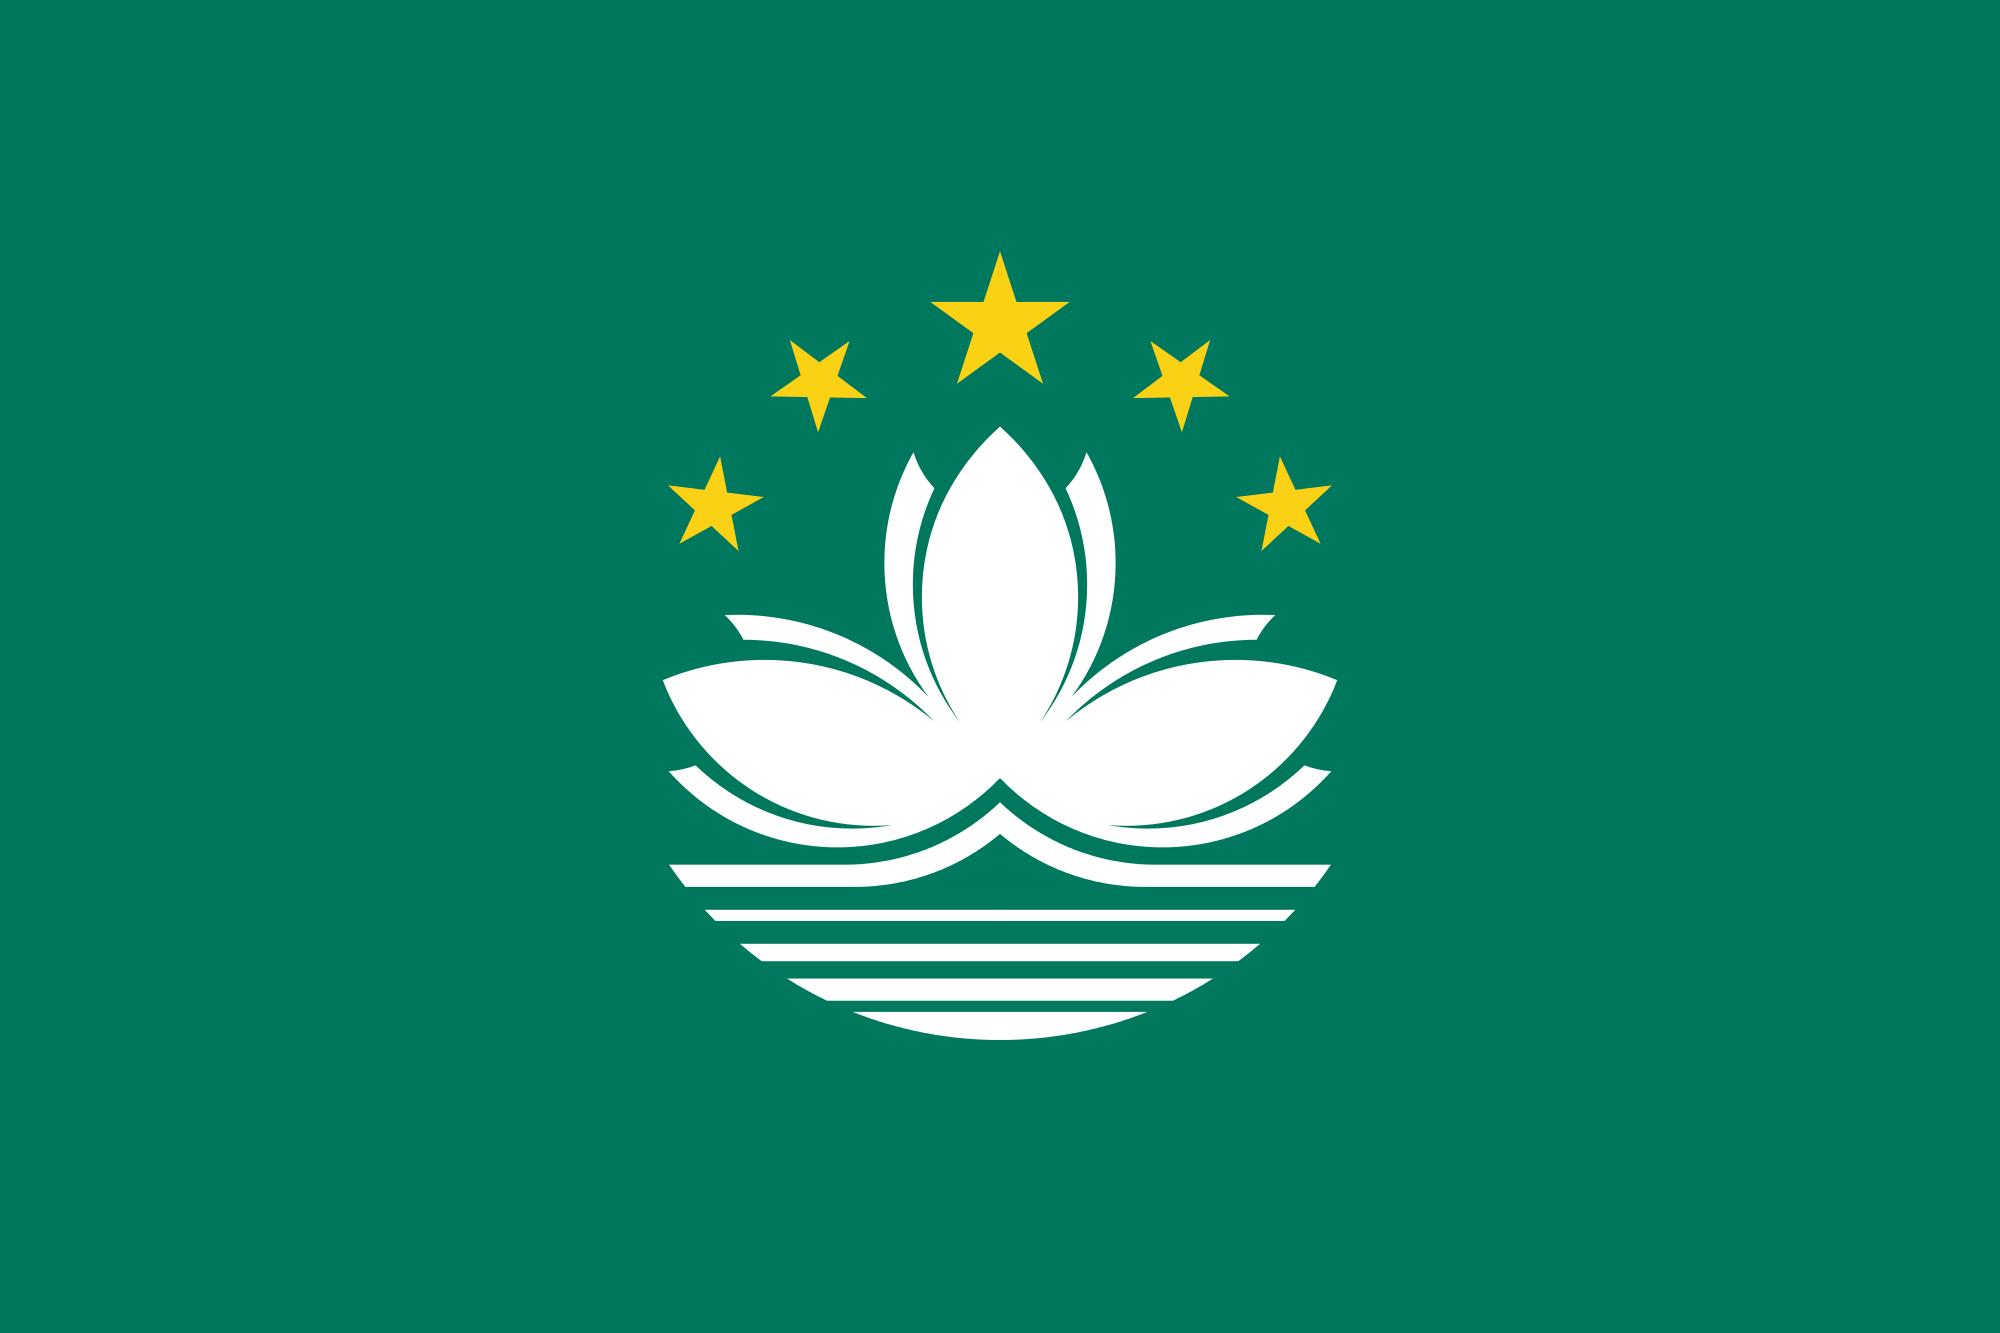 macao, 国家, 会徽, 徽标, 符号 - 高清壁纸 - 教授-falken.com